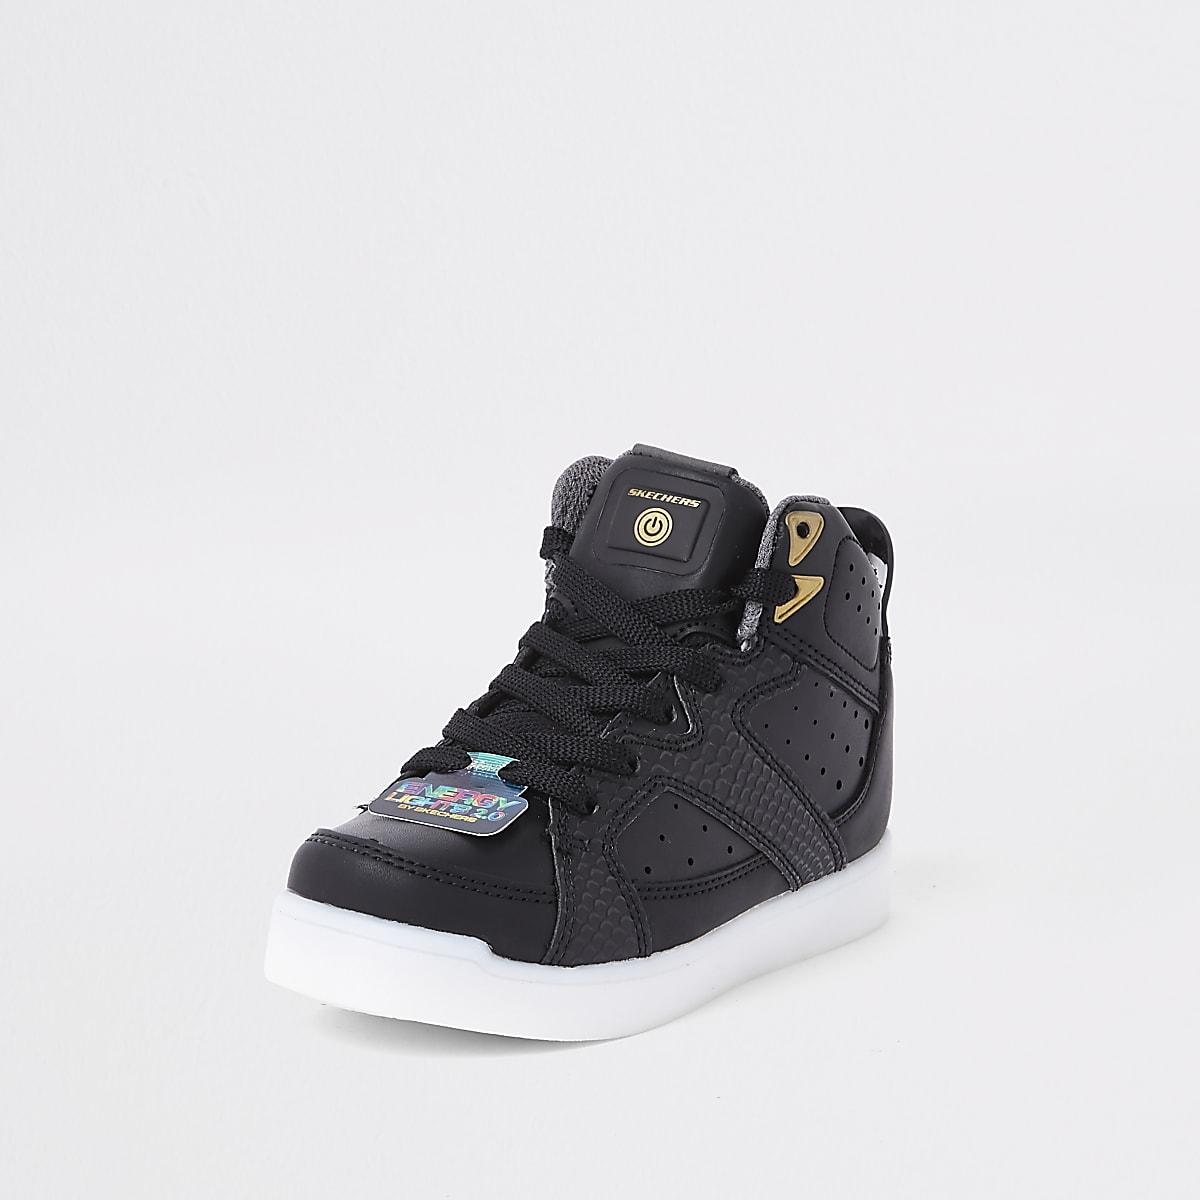 fdcc89d97 Black Skechers black light up trainers - Trainers - Footwear - boys